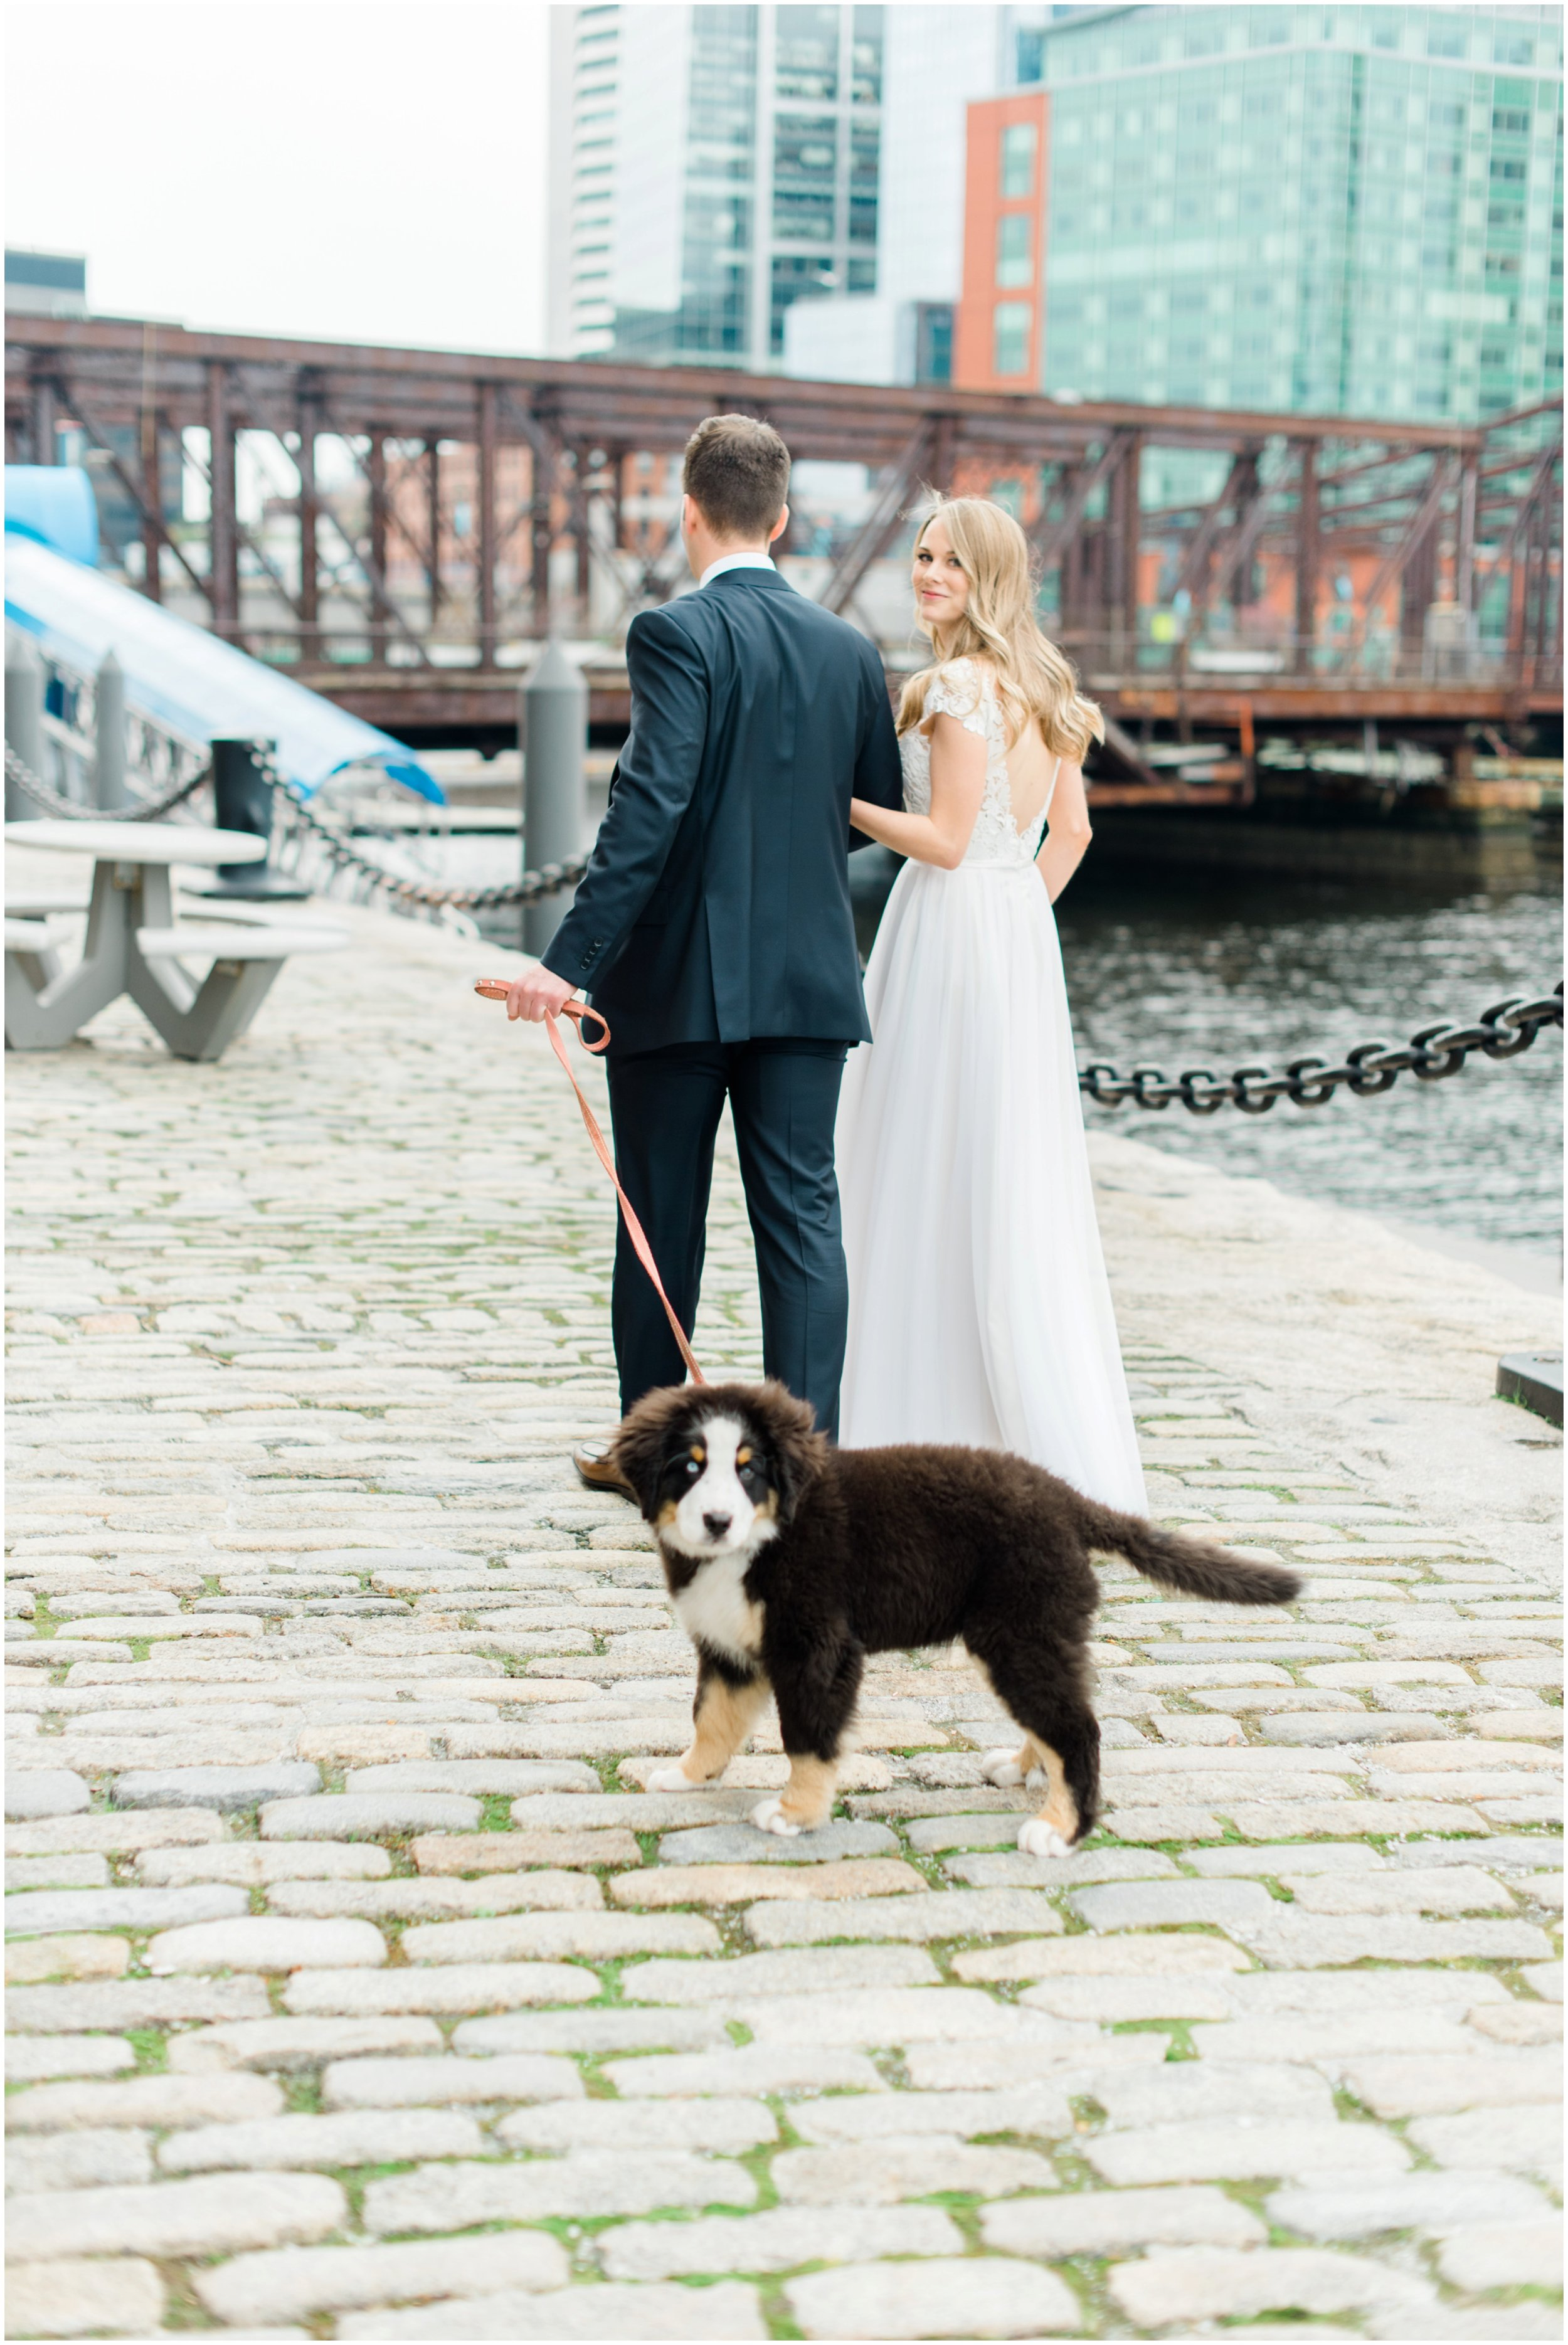 jay-robin-married-row-34-boston-17.jpg